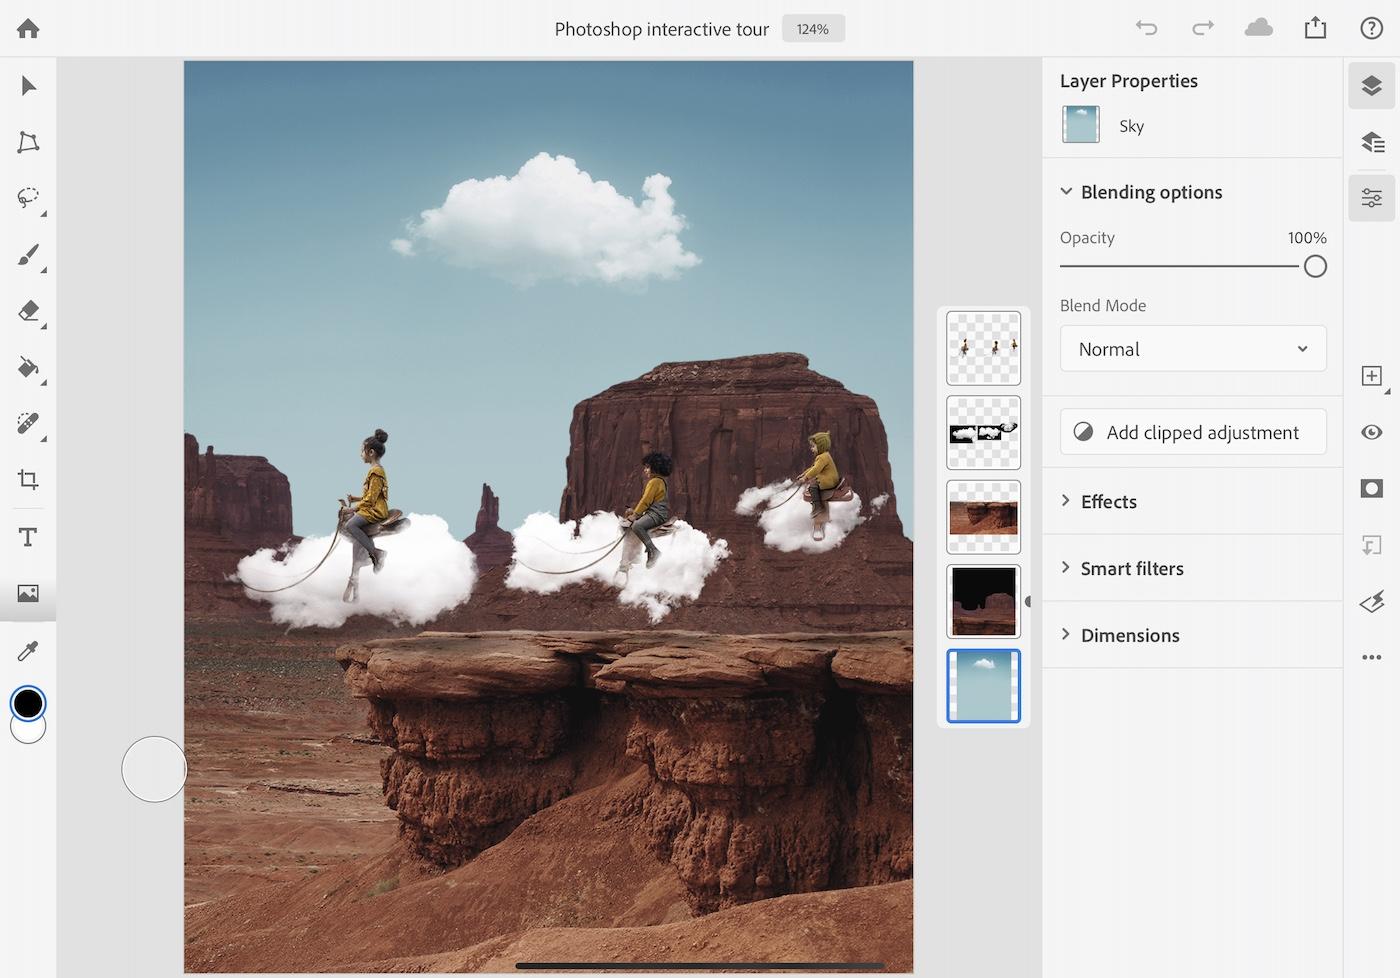 Photoshop for iPad 1